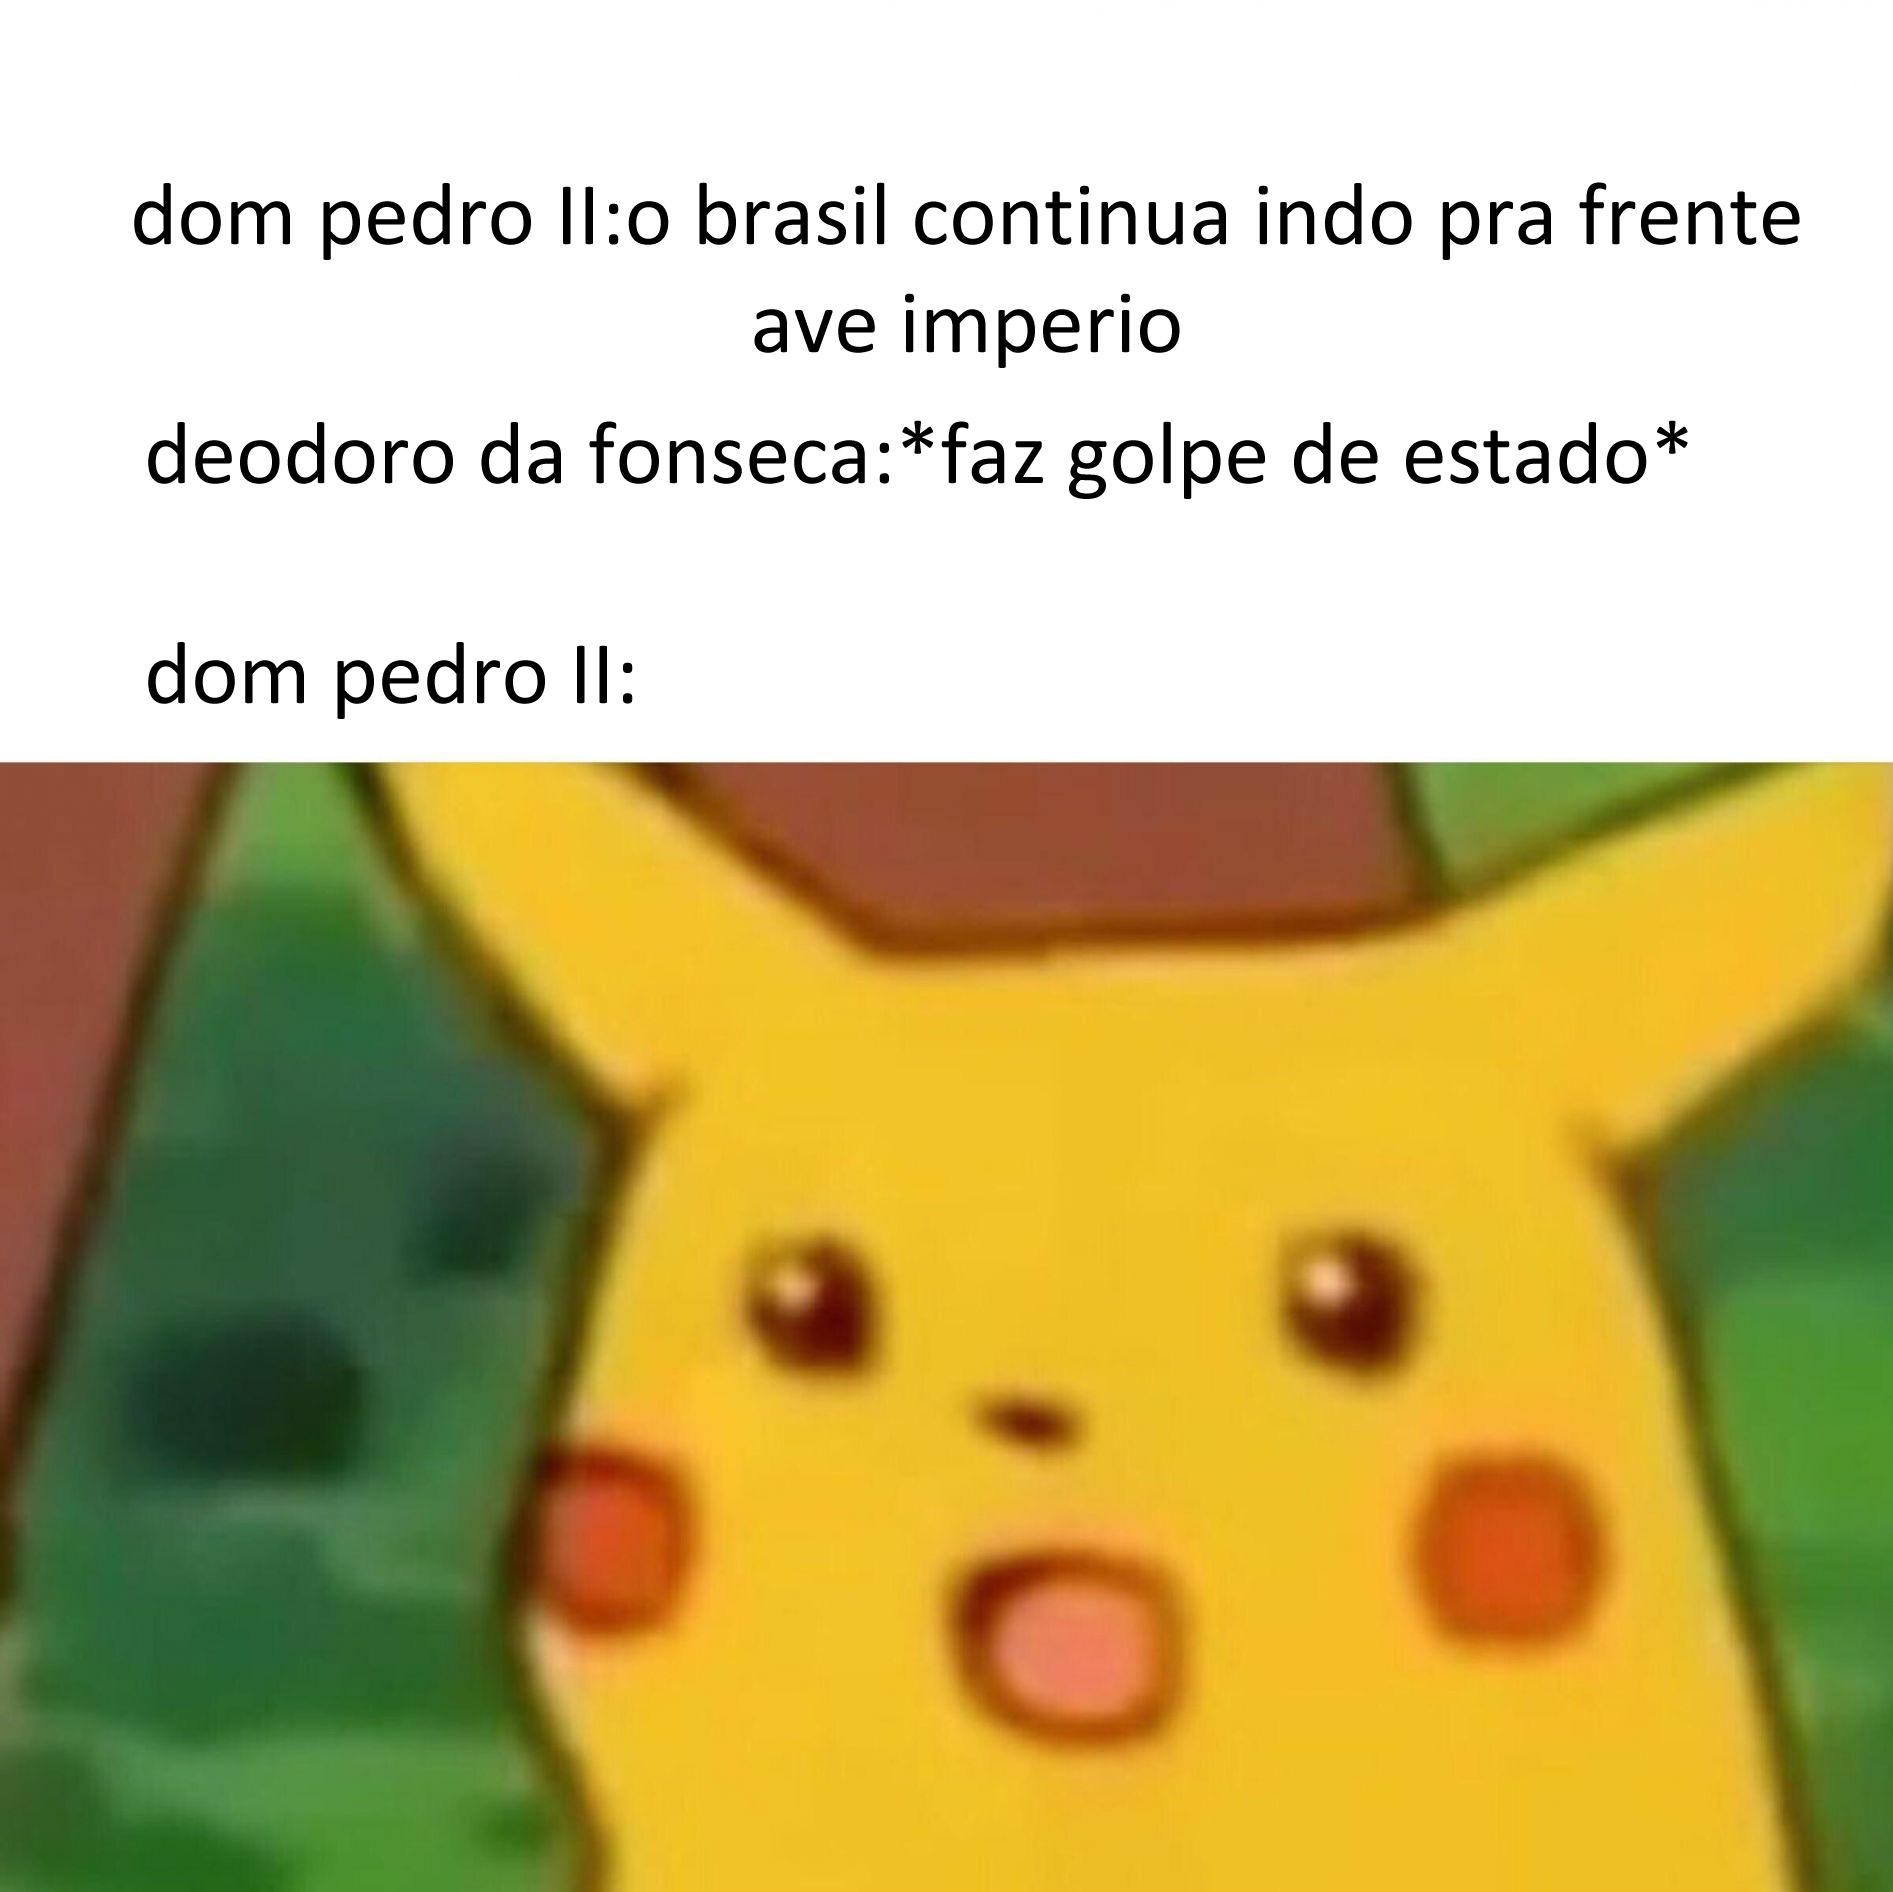 porra deodoro - meme